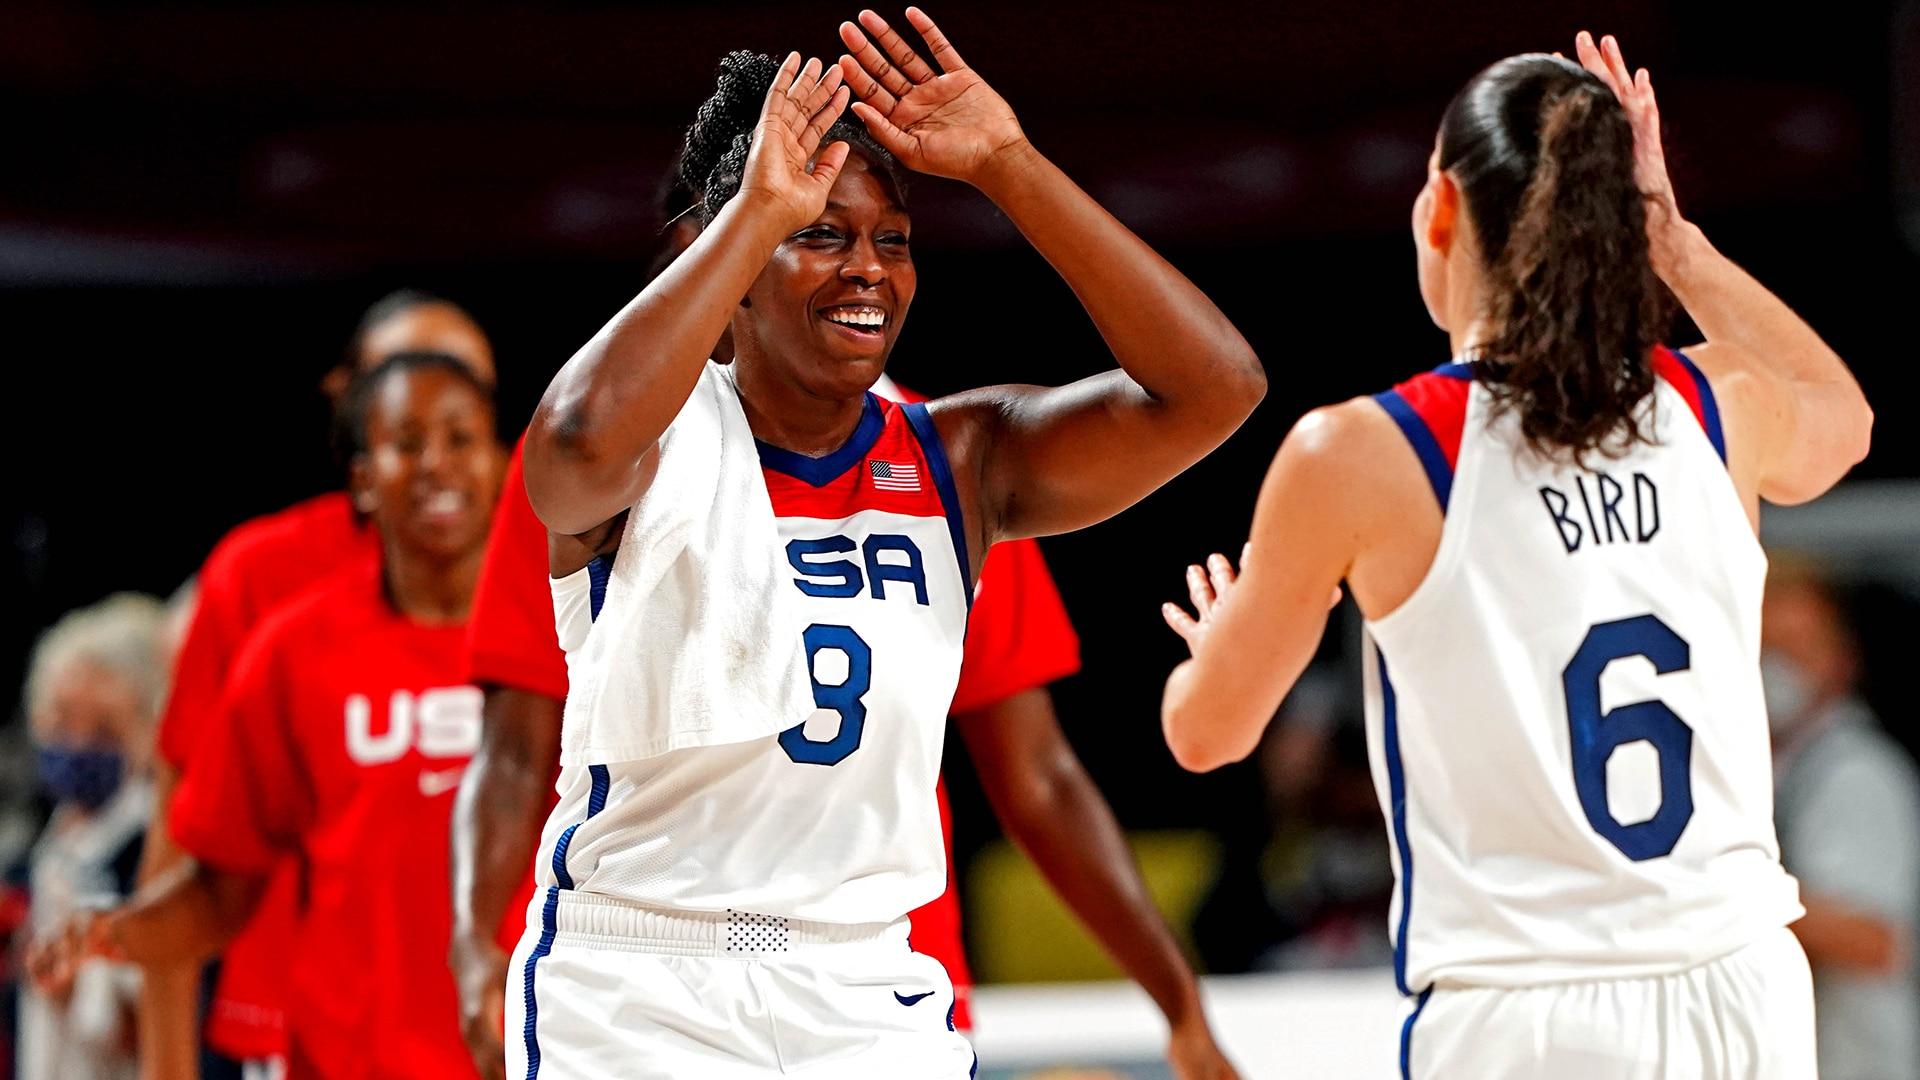 Image for Women's Basketball Quarterfinals: USA readying for Australia